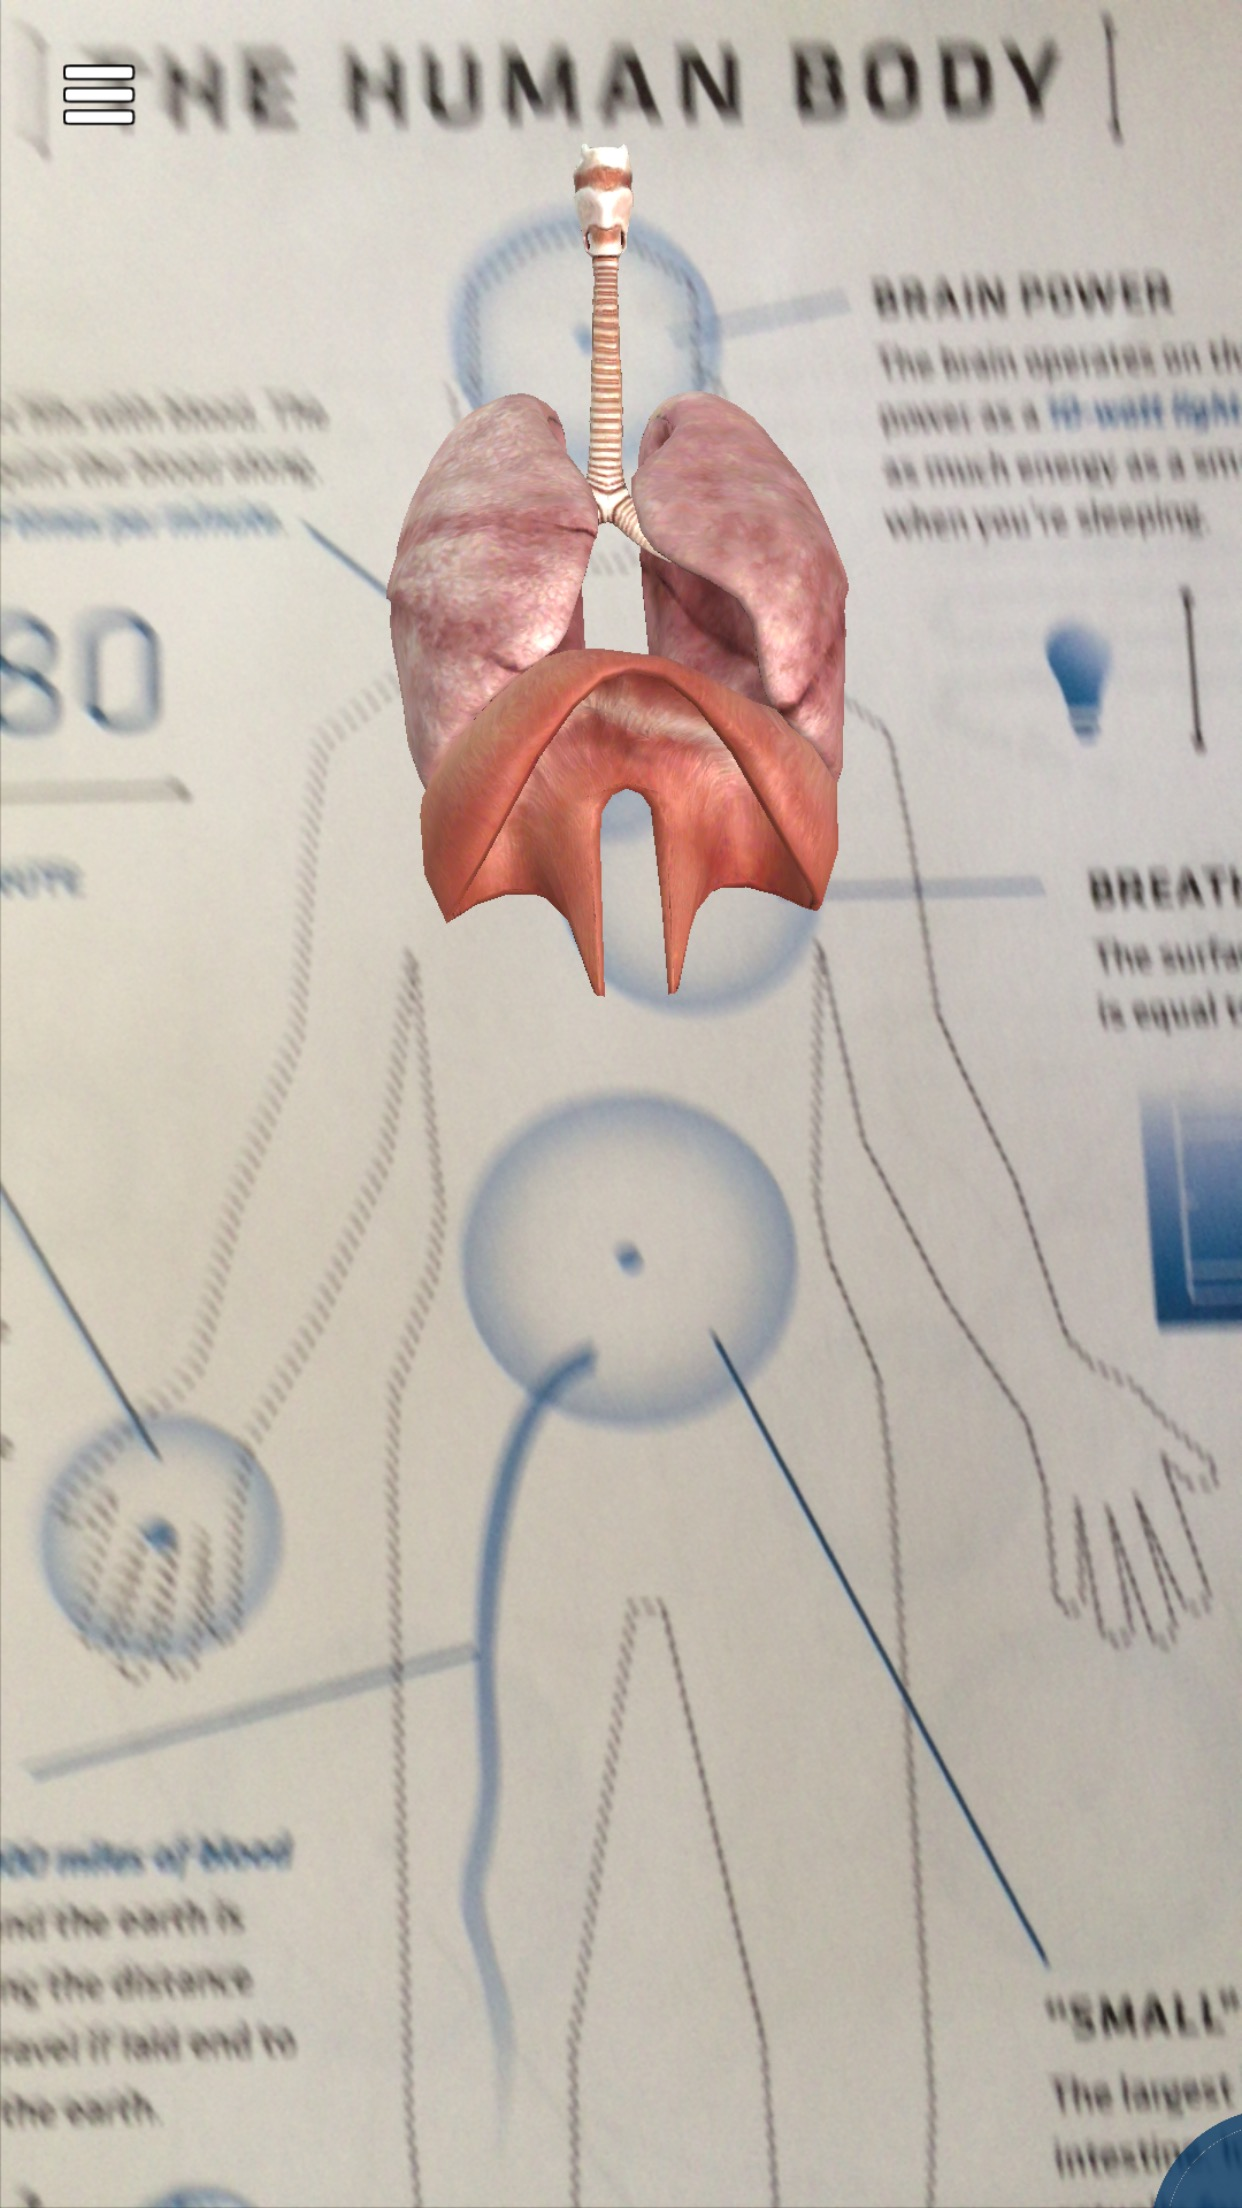 EdTech Summer – Anatomy 4D | AliciaRay.com